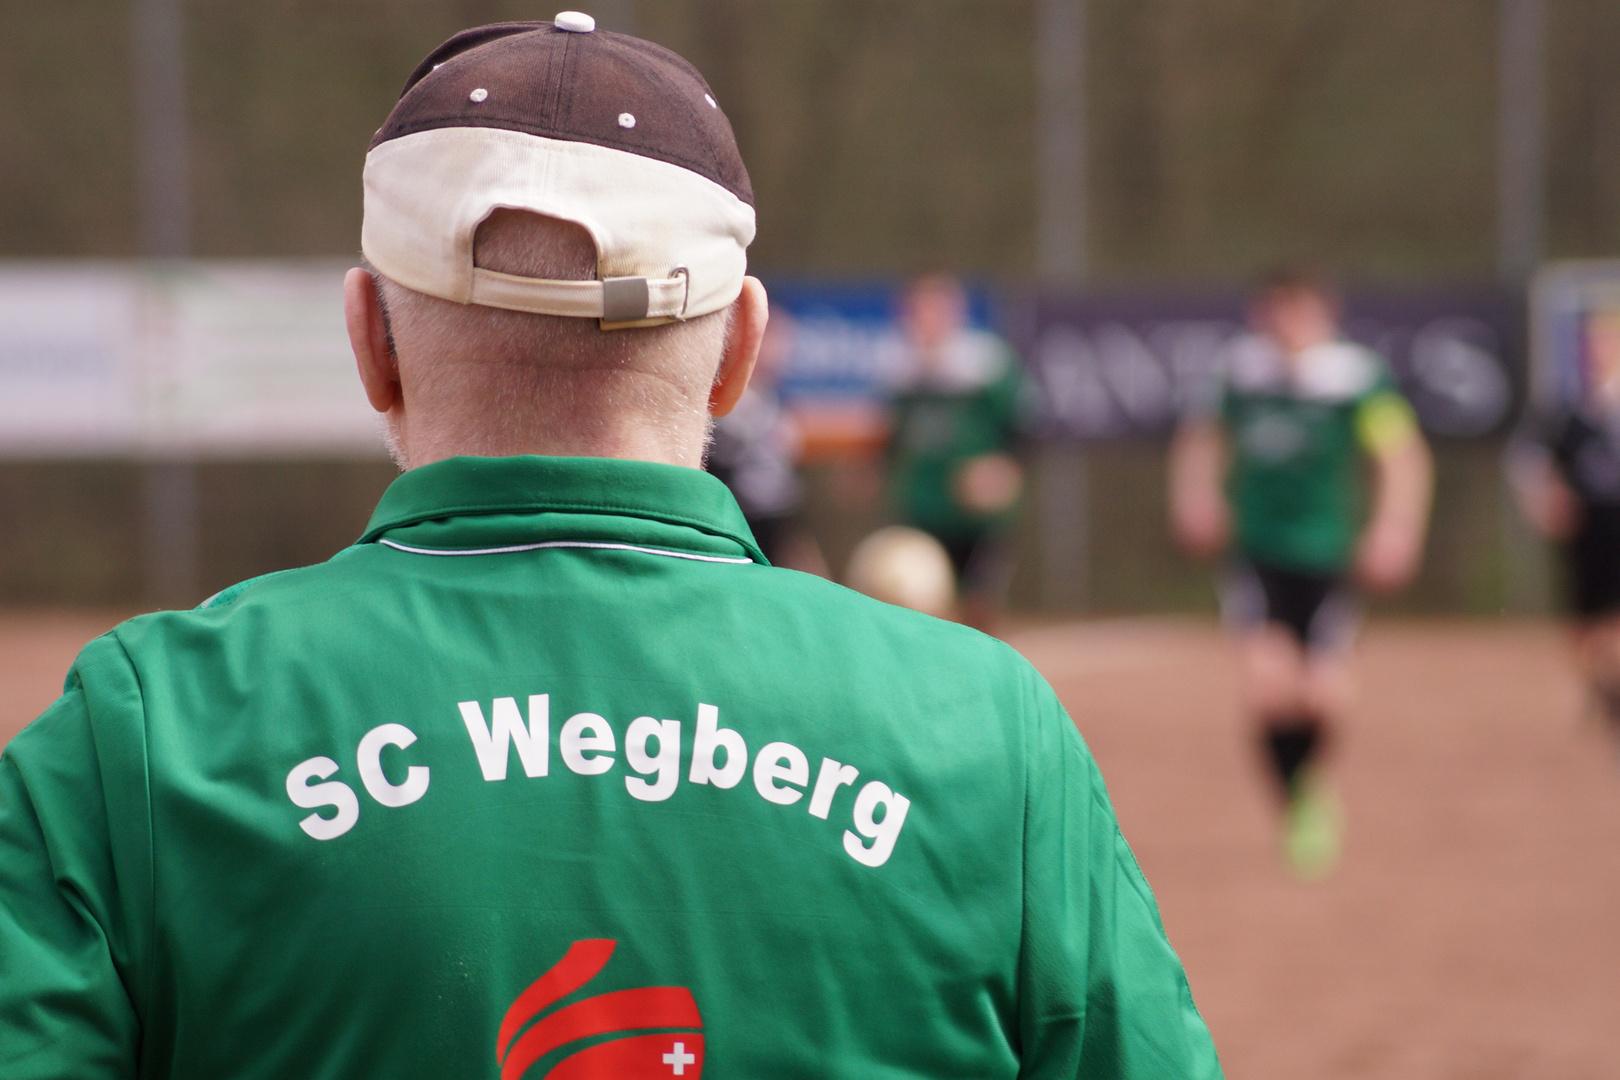 Sani des SC Wegberg am Spielfeldrand